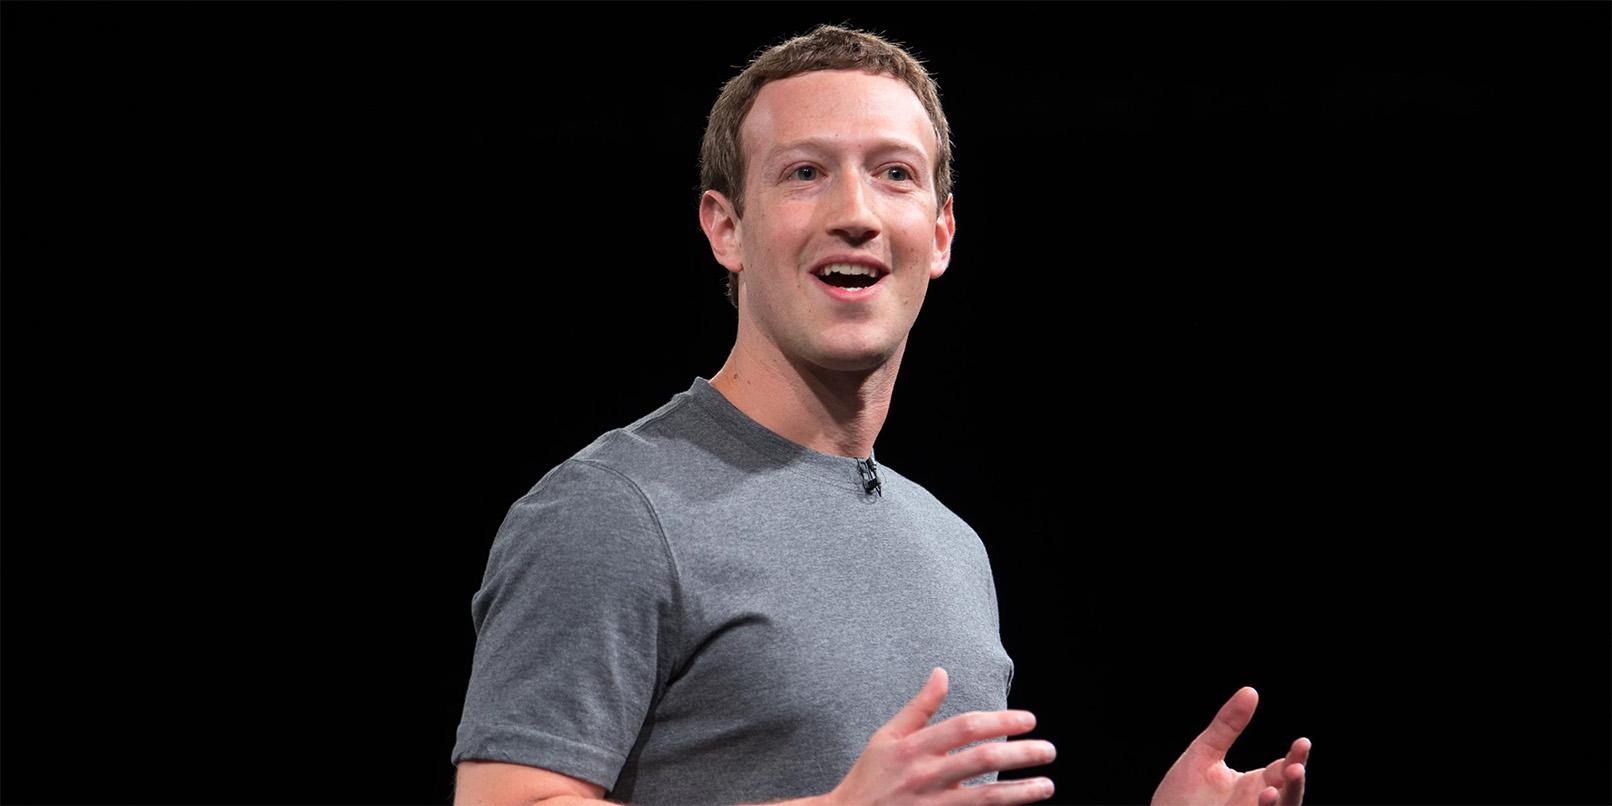 Mark Zuckergerb, CEO, Facebook